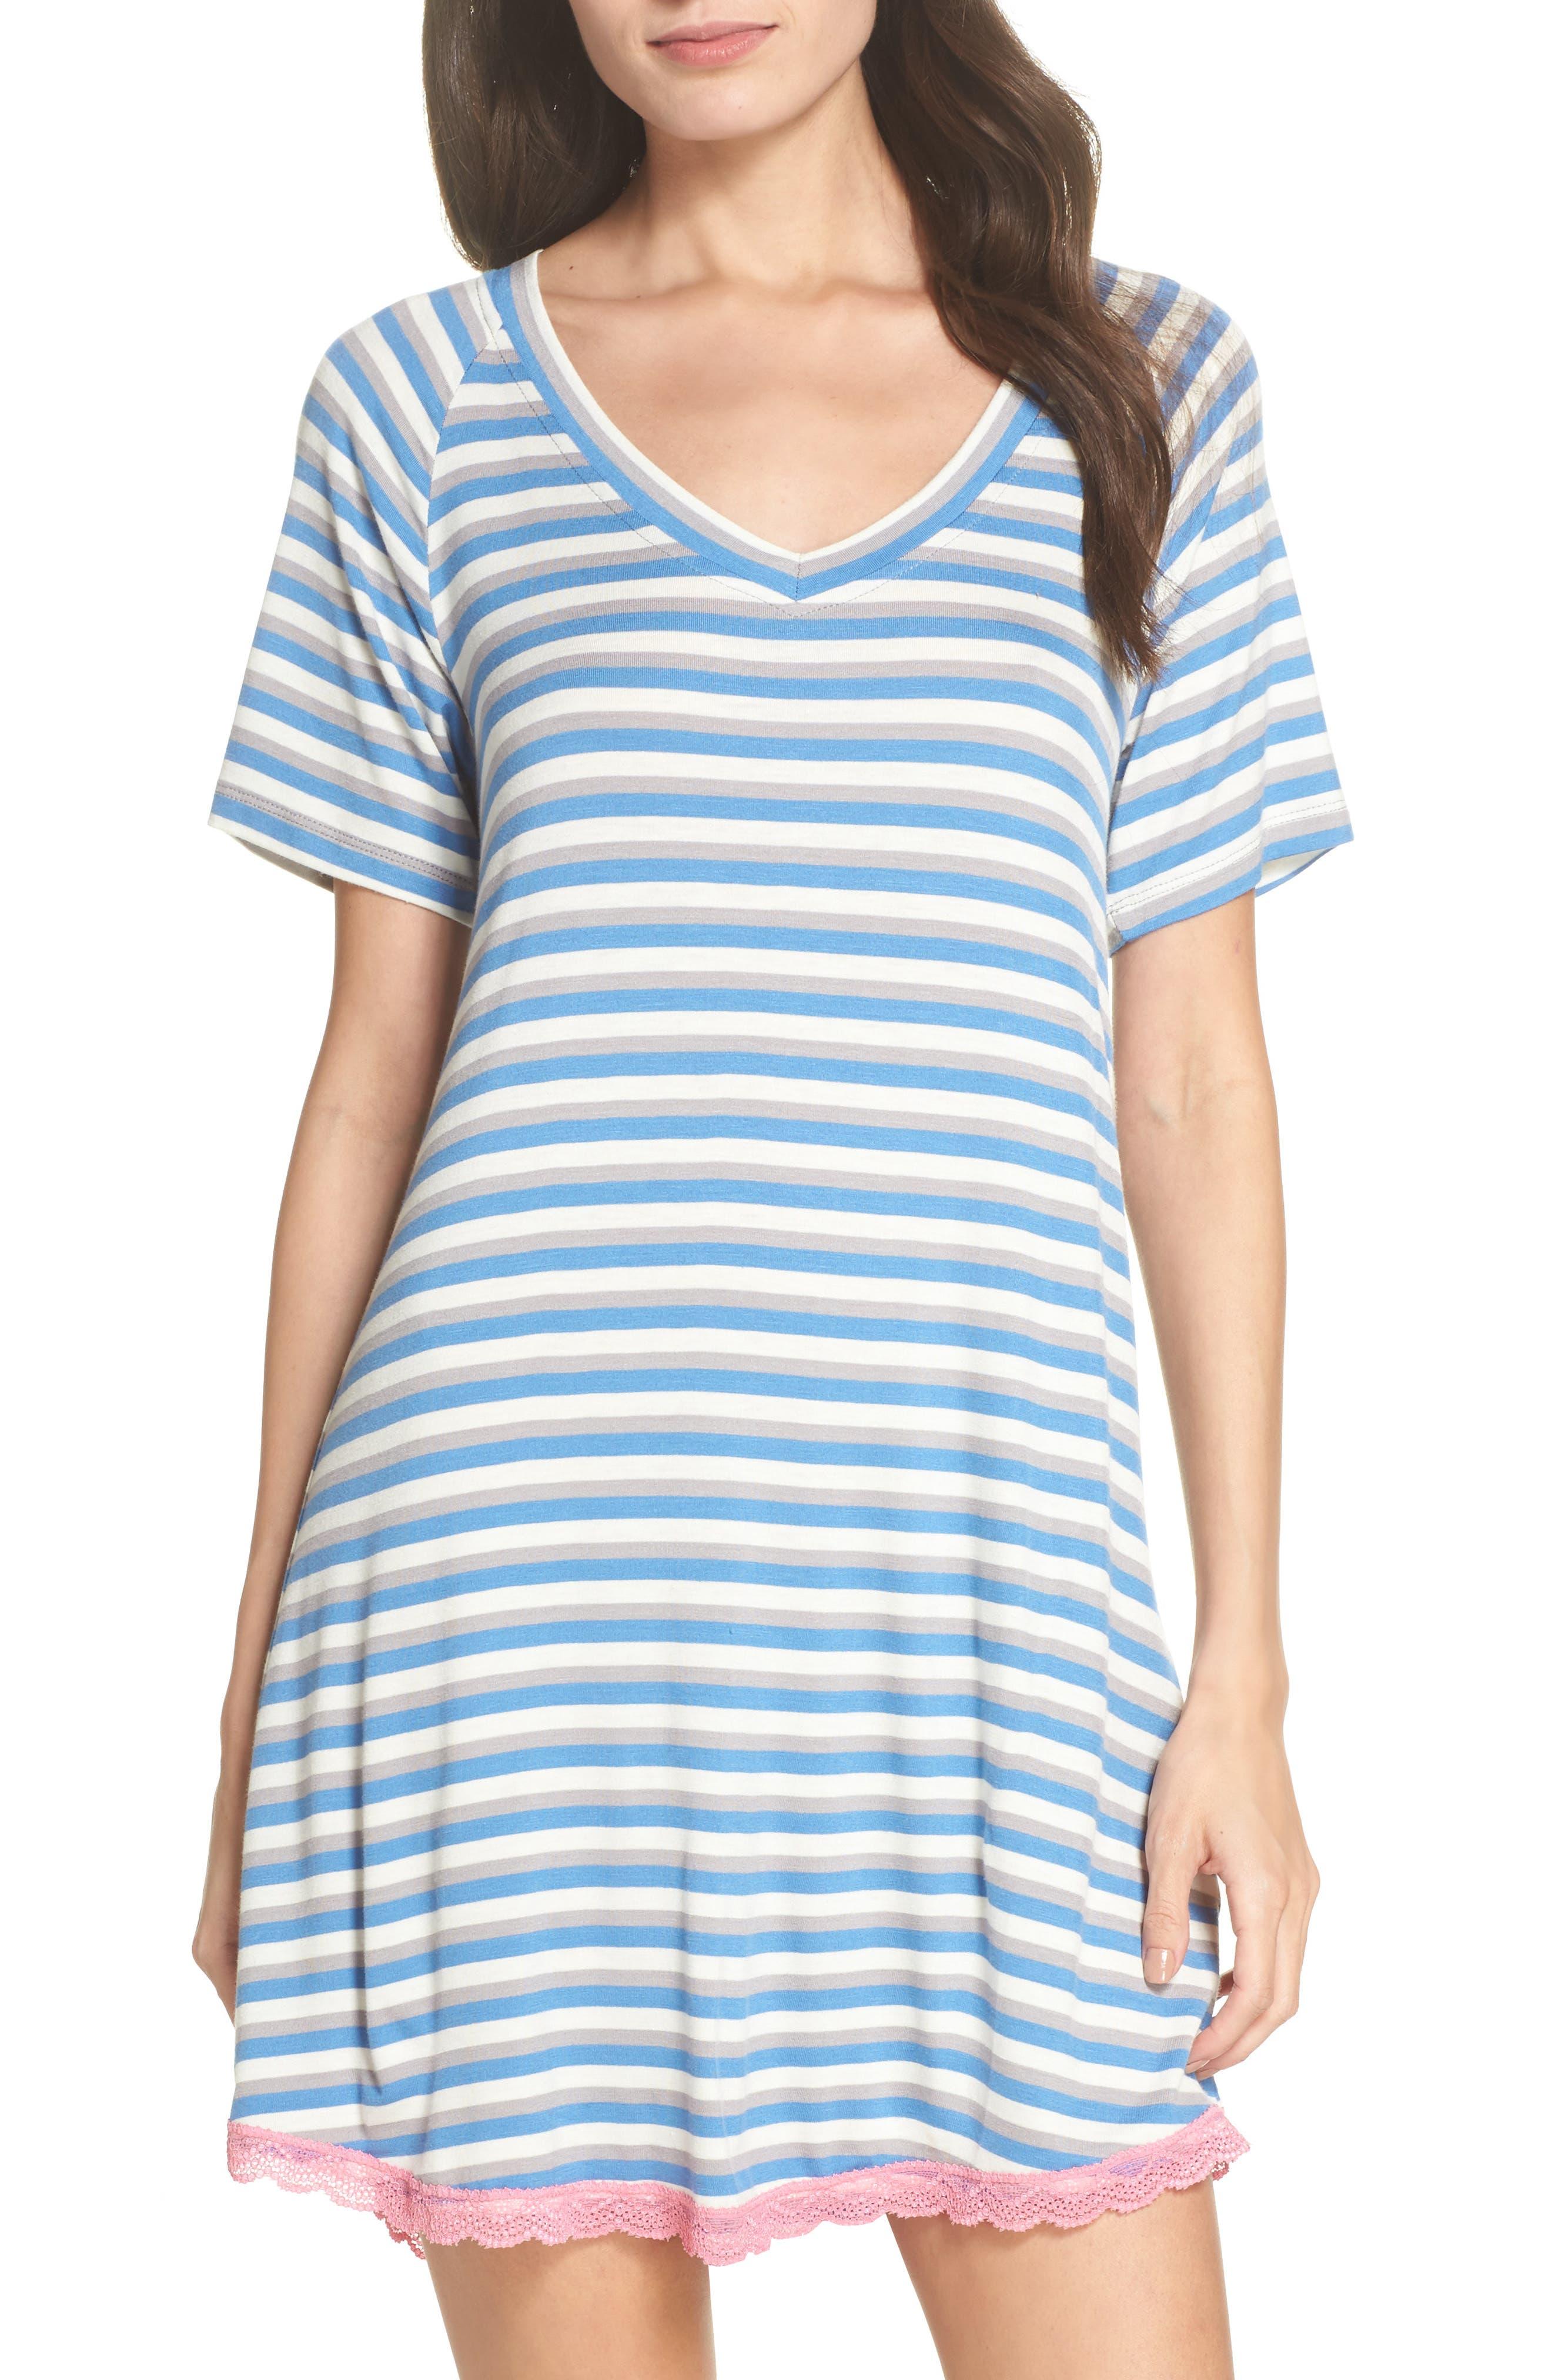 Alternate Image 1 Selected - Honeydew Lace Trim Sleep Shirt (2 for $60)